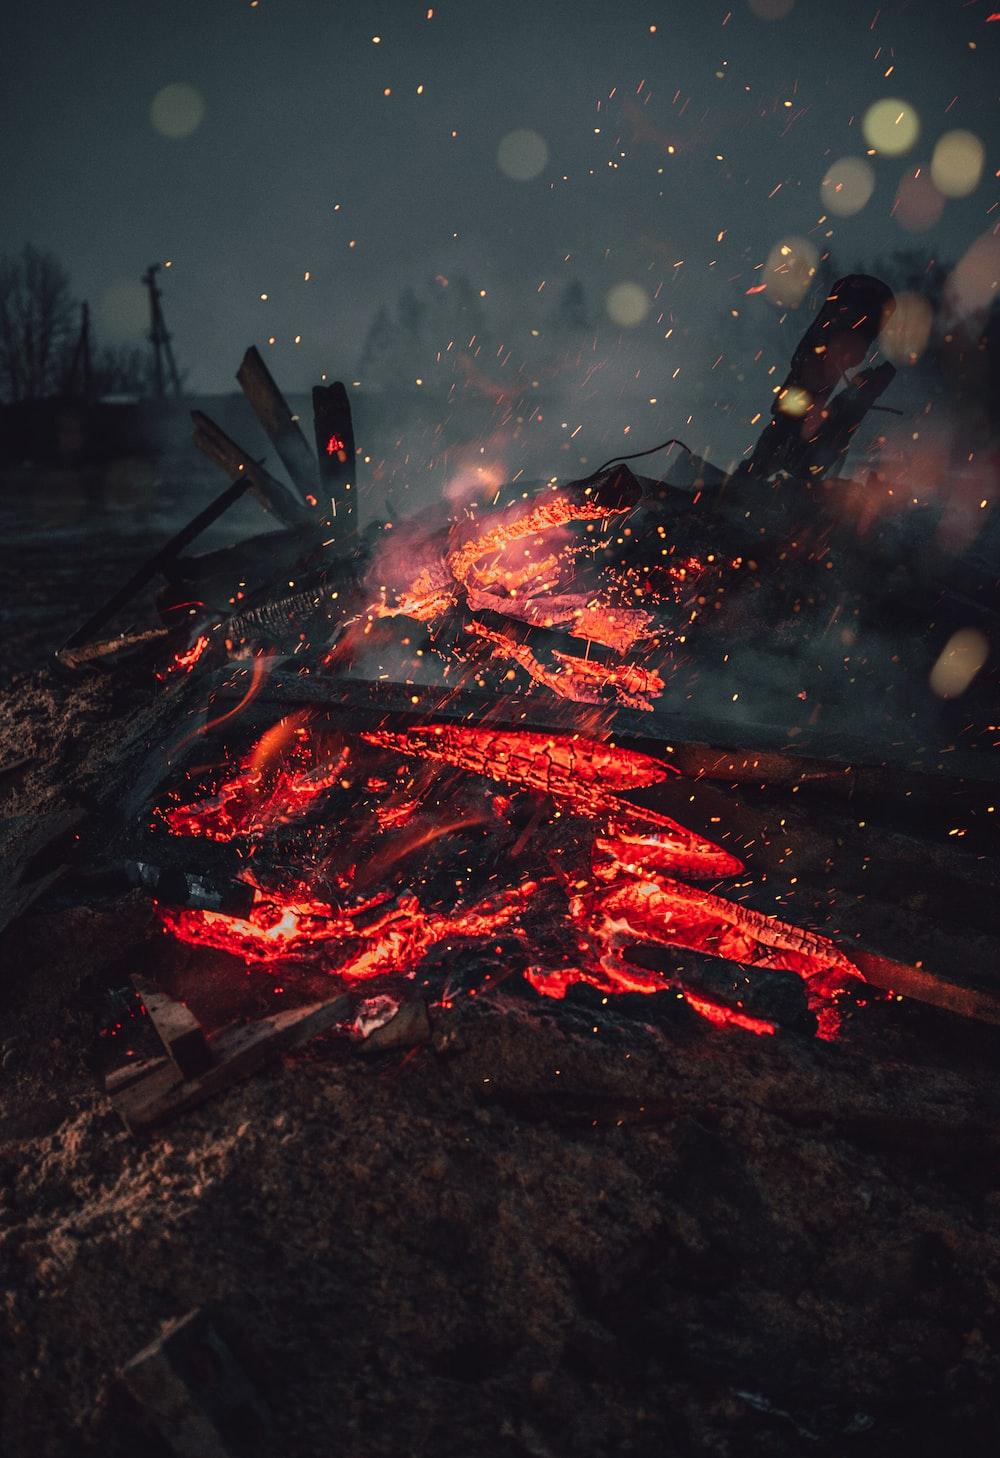 wood lumbers on fire